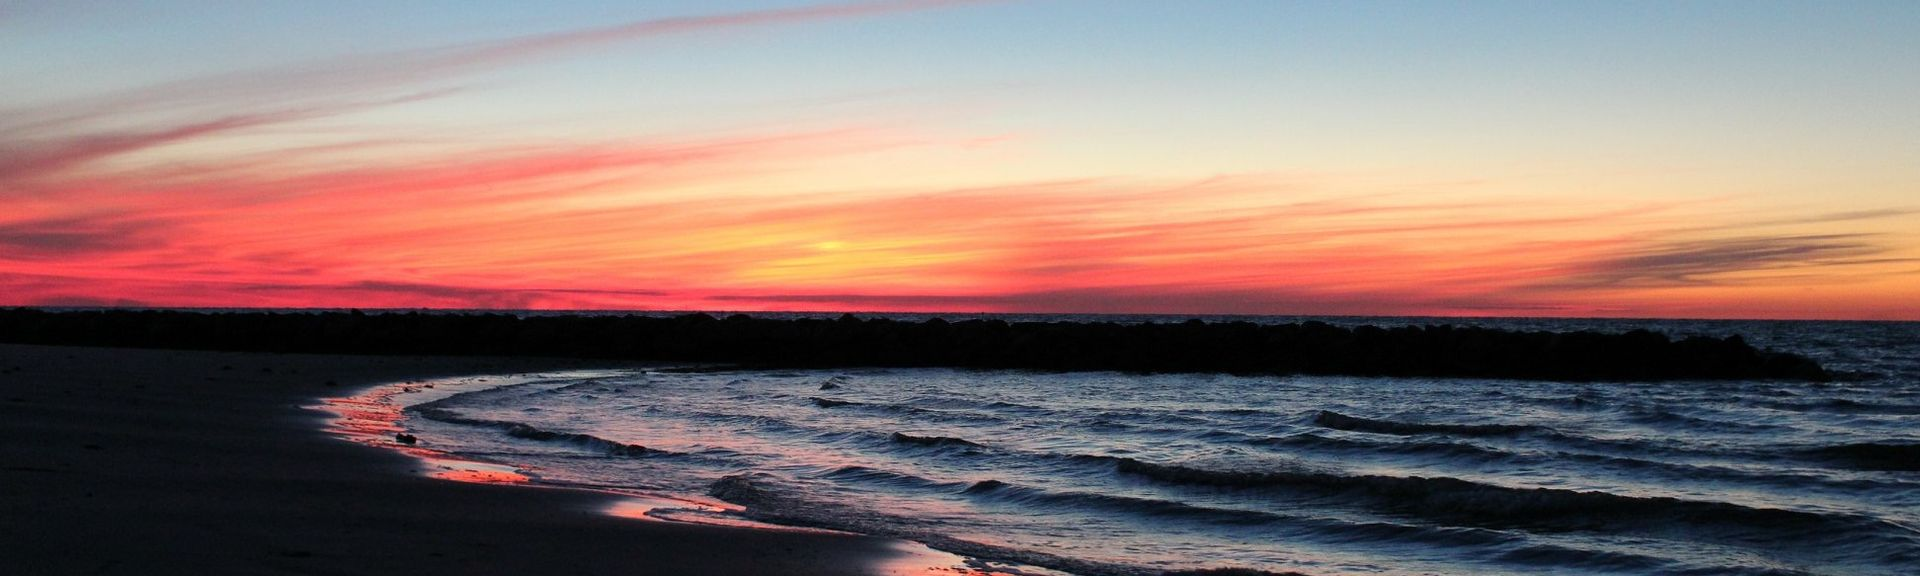 Smith Beach, VA, USA